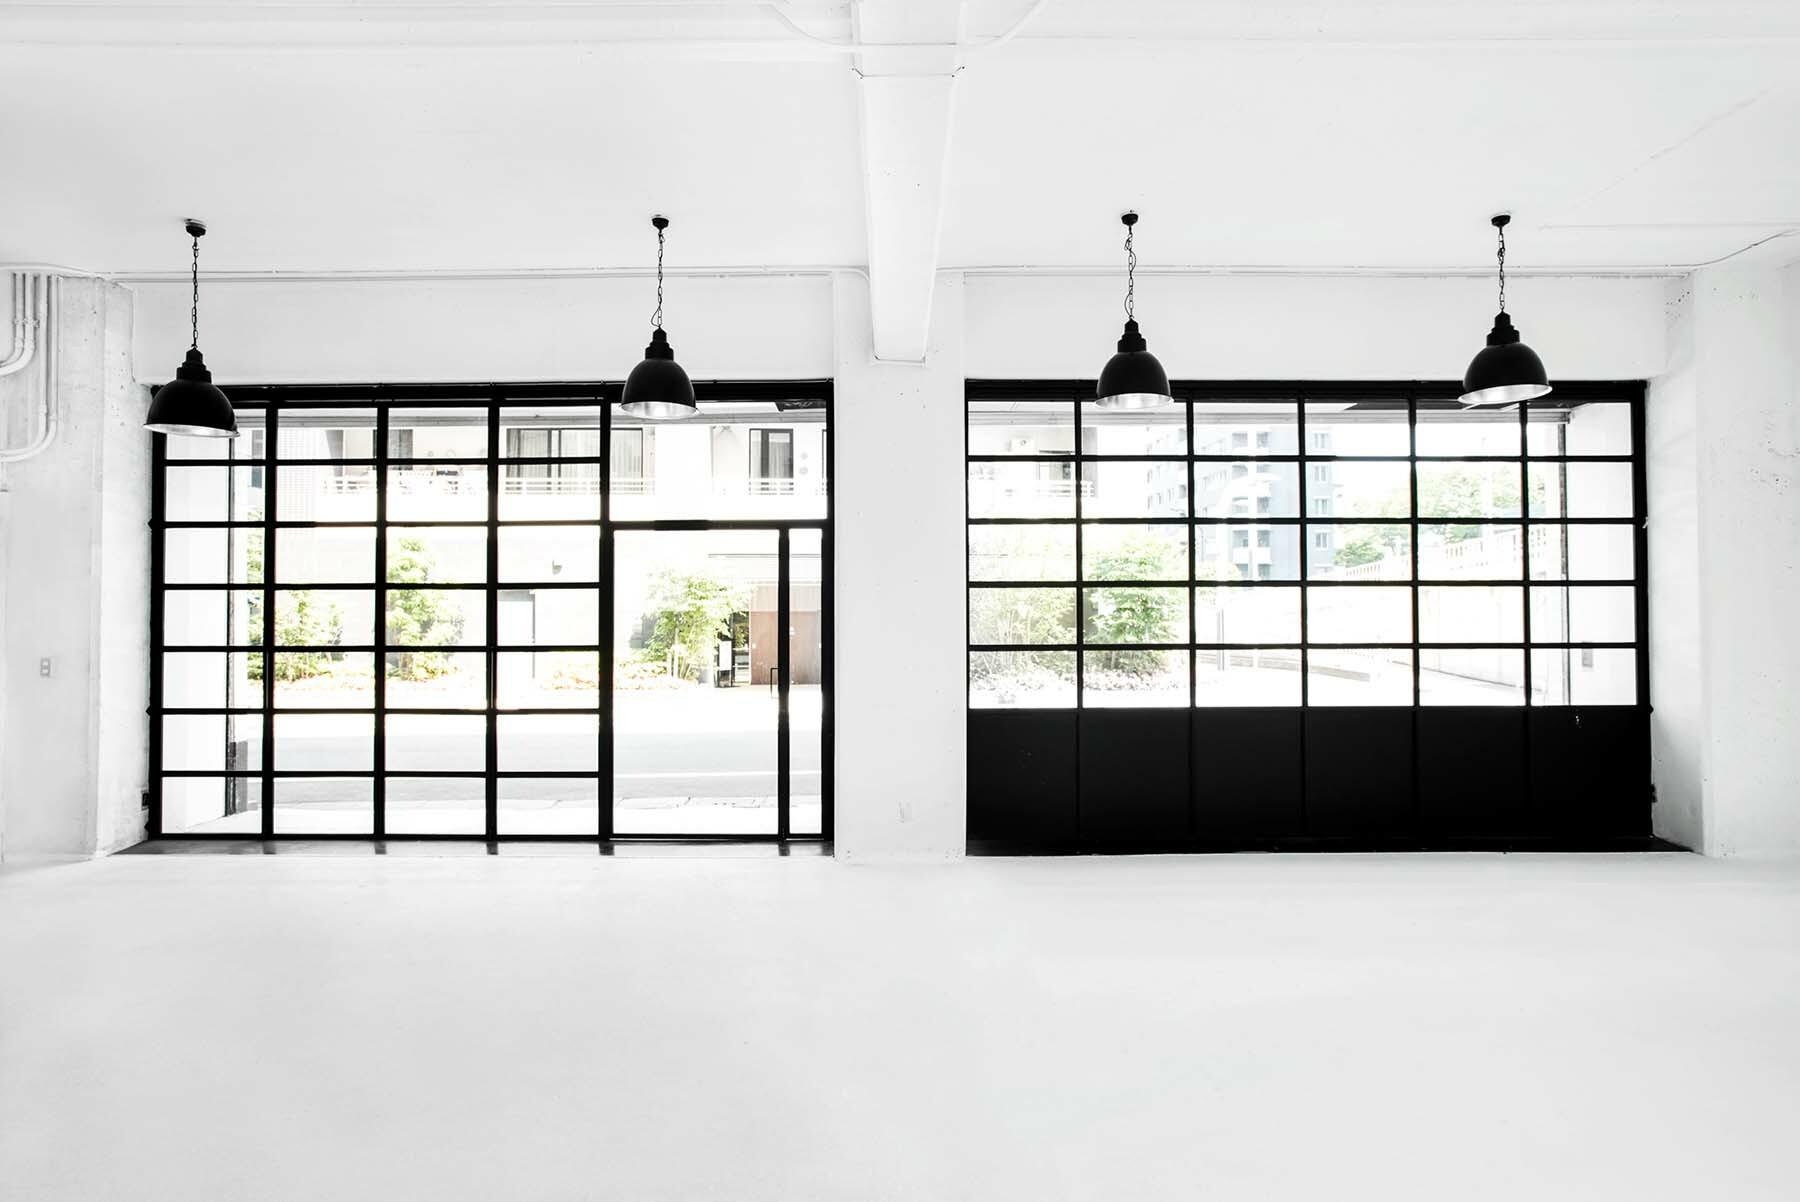 StudioBRICK 1F (スタジオブリック八丁堀1F)白と黒のコントラスト